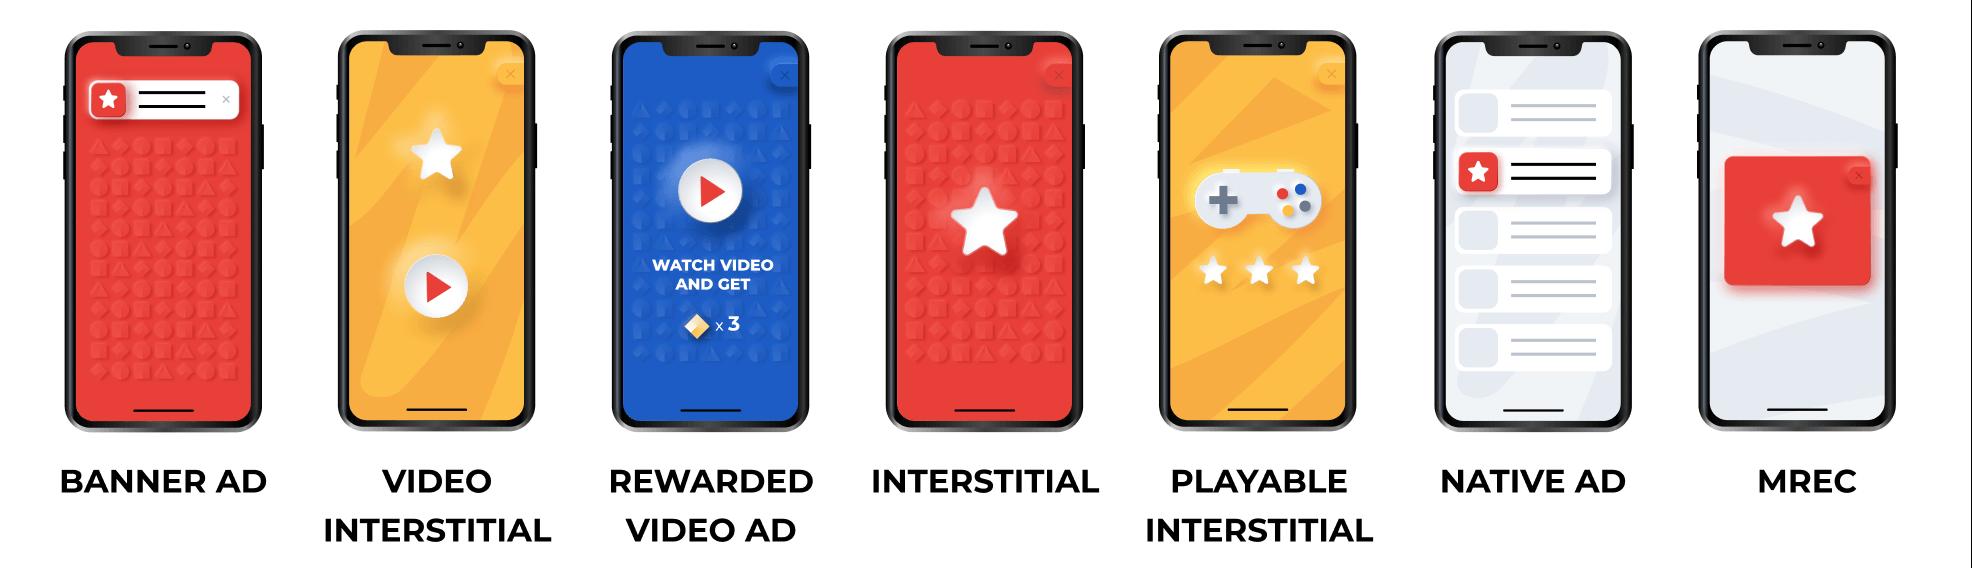 ad-types-Improving-CPI-ARPU-Mobile-Games-2